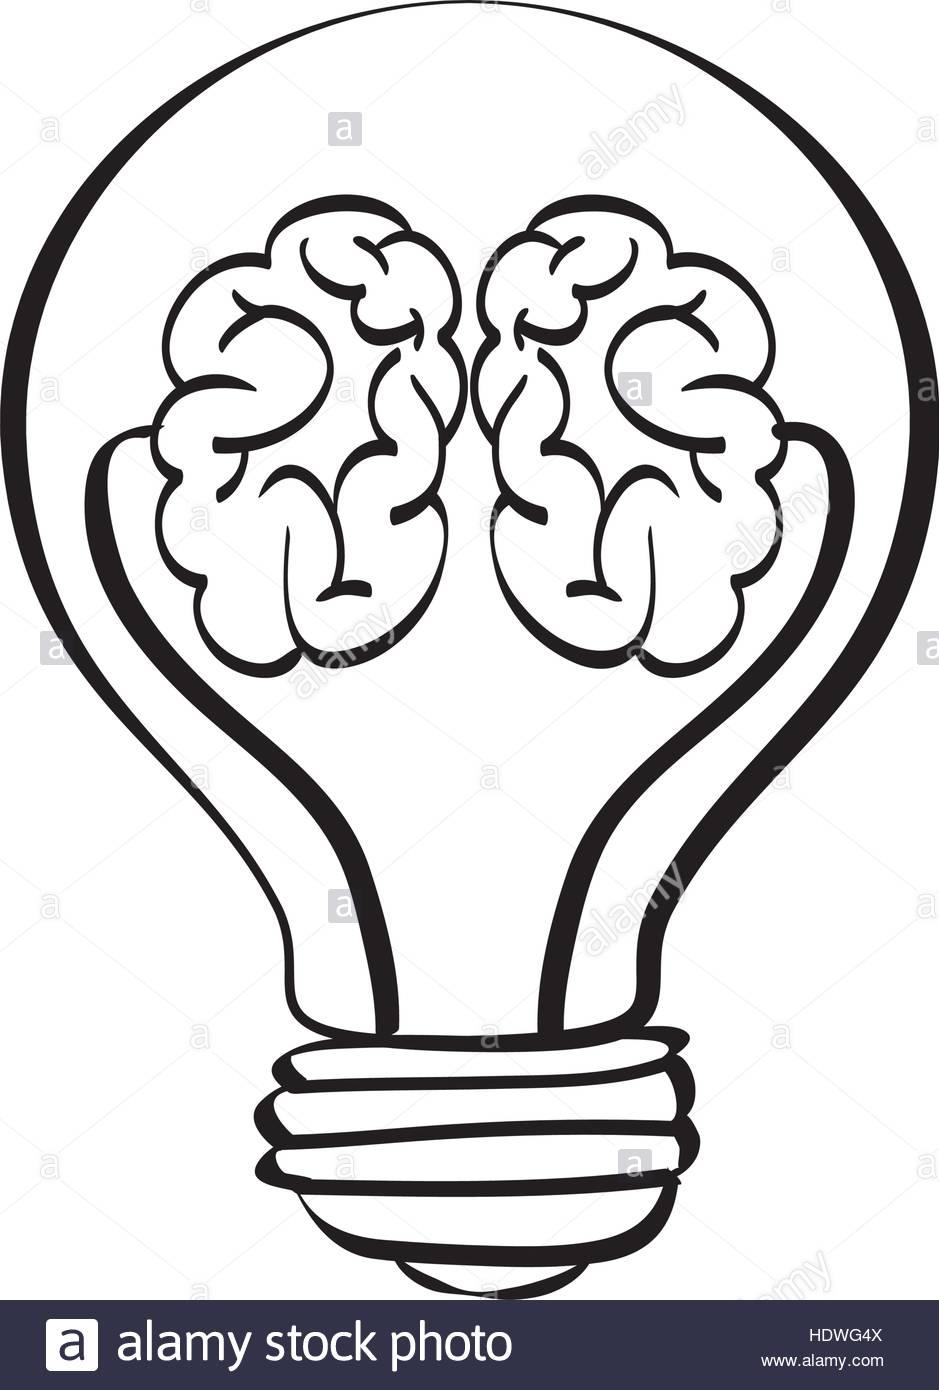 939x1390 Bulb Light Draw Icon Vector Illustration Graphic Design Stock